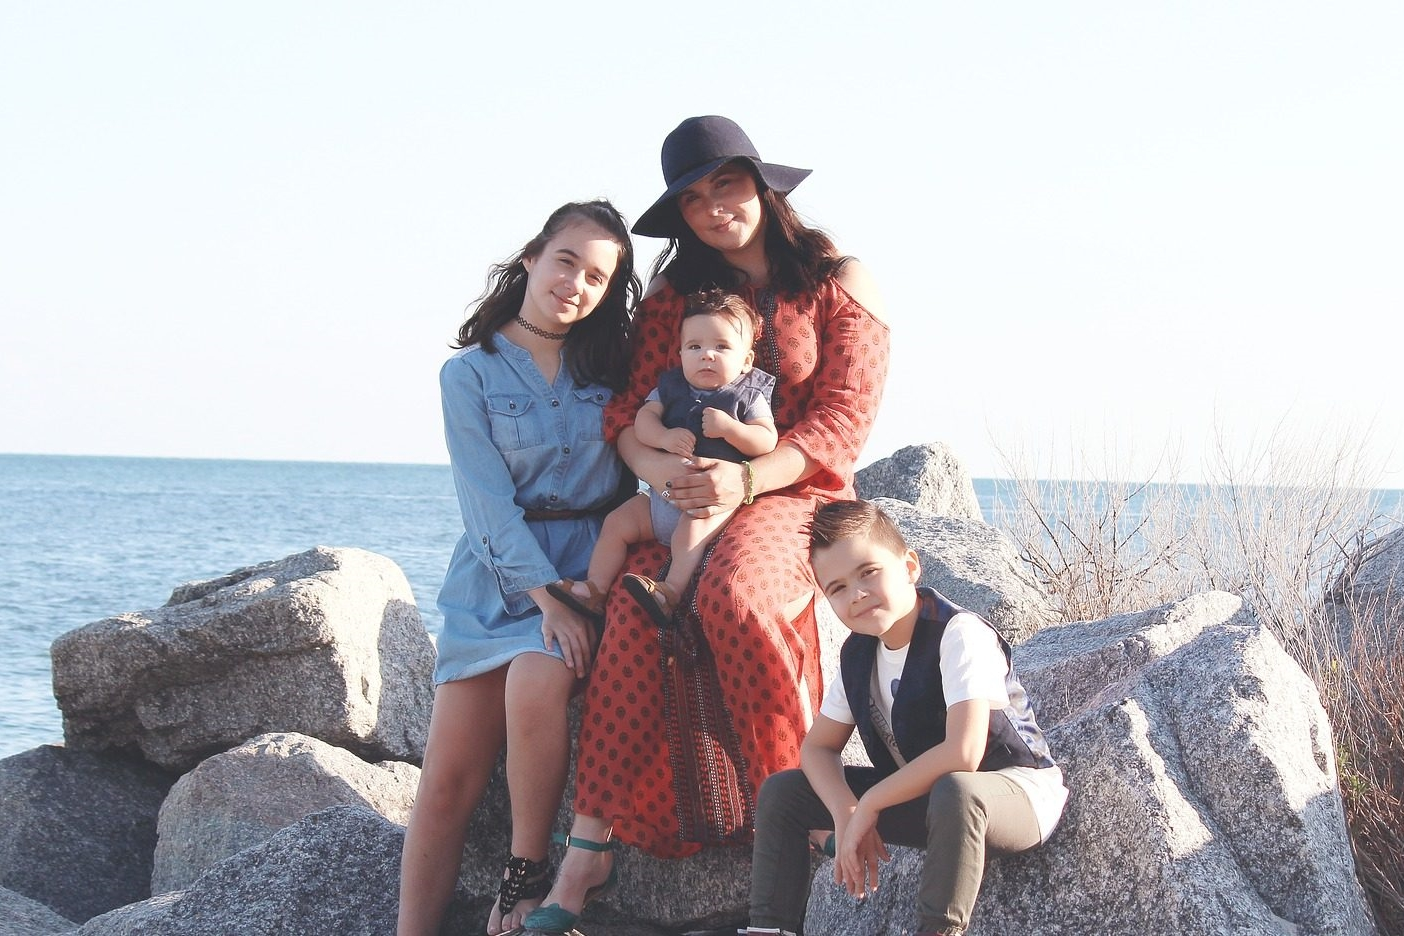 mom children rocks beach